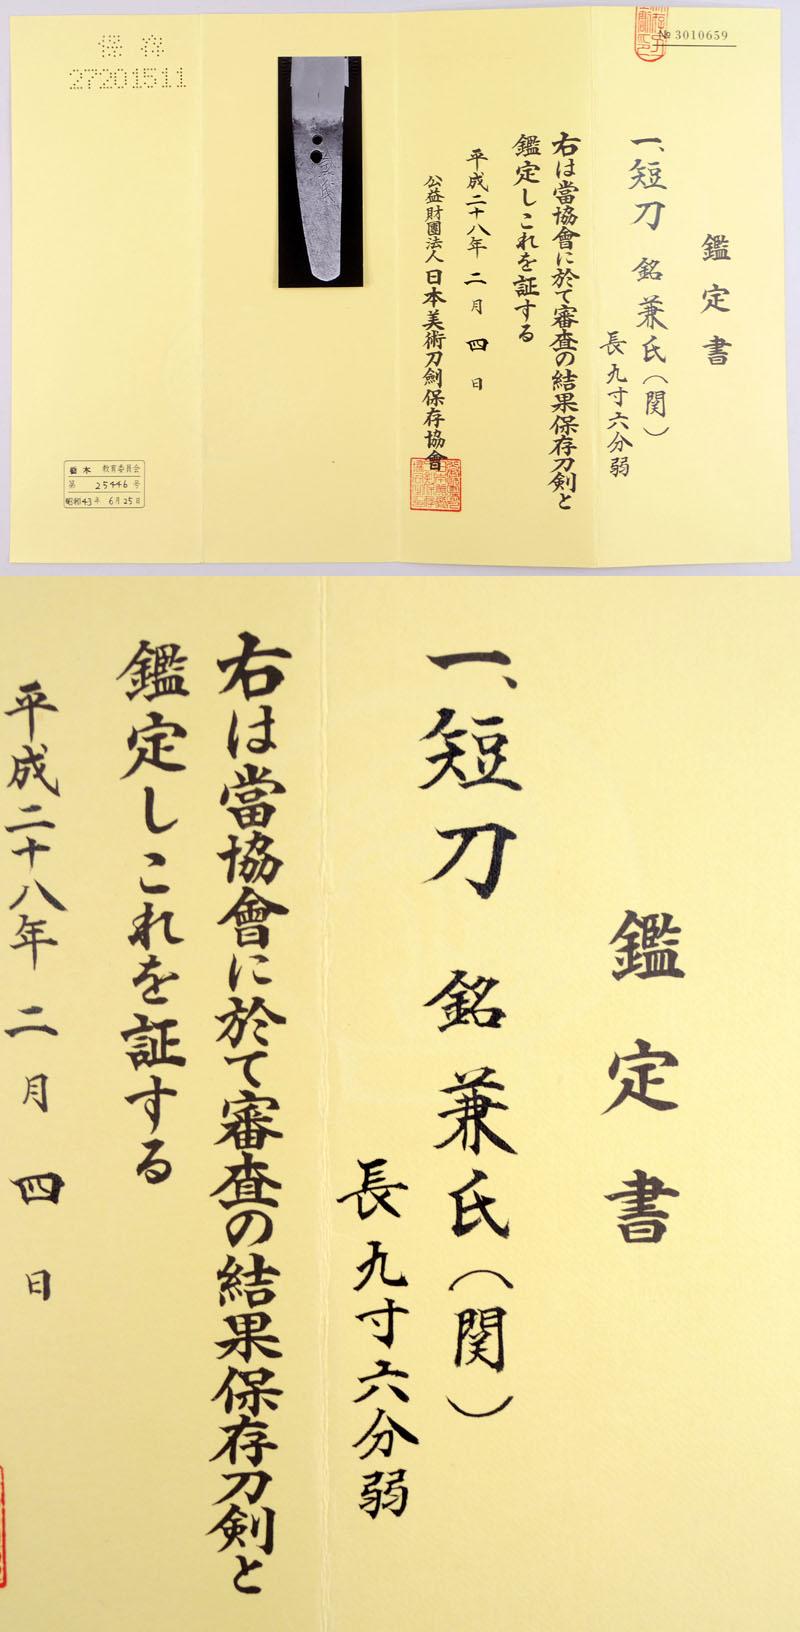 兼氏(関) Picture of Certificate